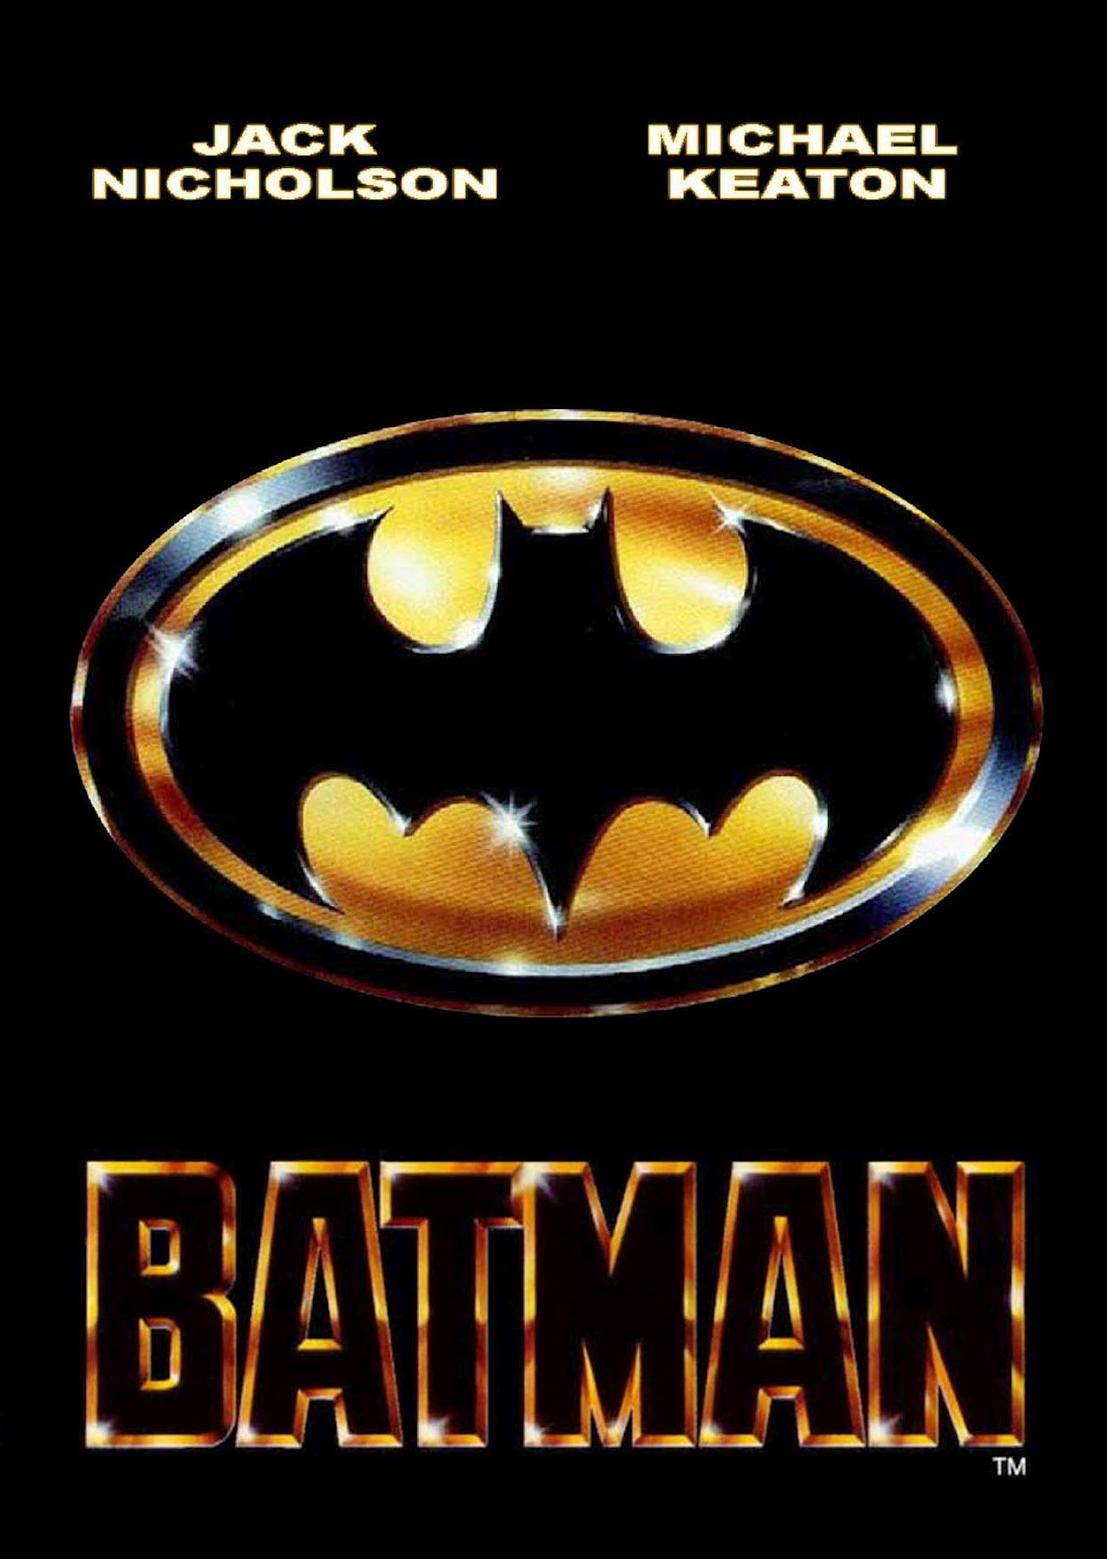 Batman Movie Poster 1989